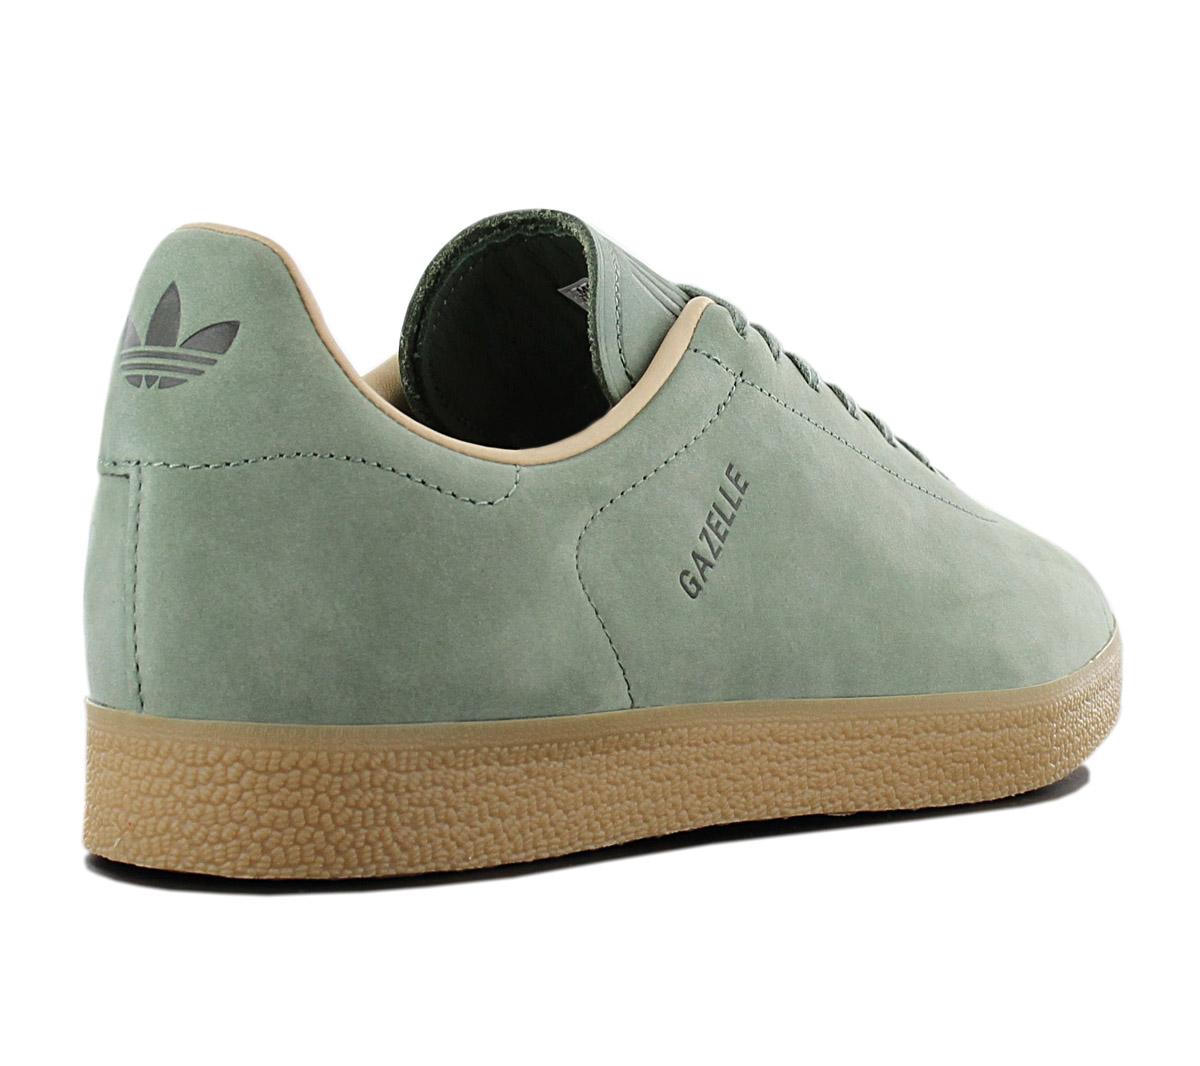 adidas Originals - Gazelle Decon - Grüne Sneaker, CG3705